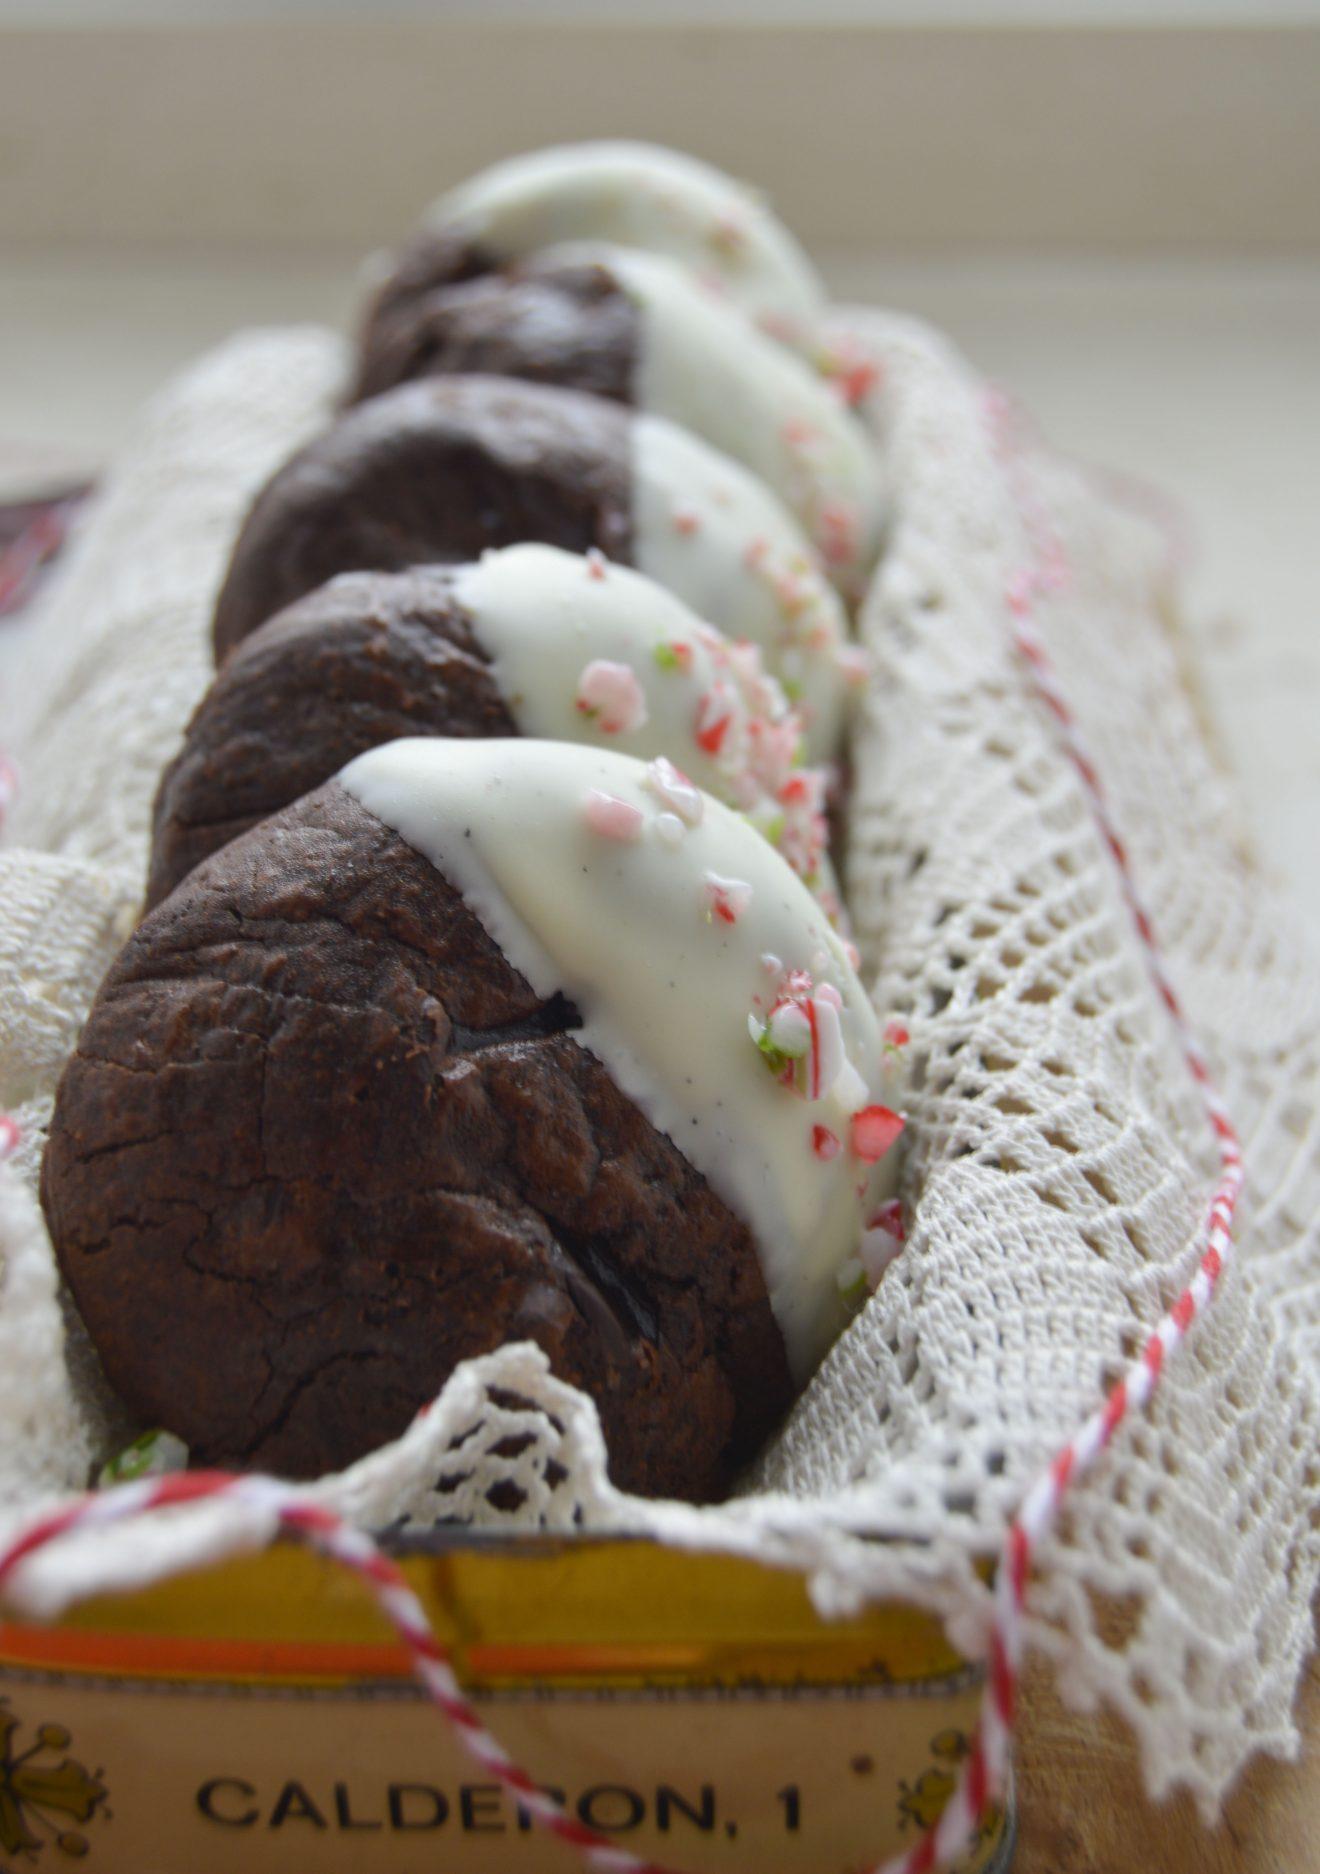 Galletas trufadas de chocolate para navidad. Aroma de chocolate